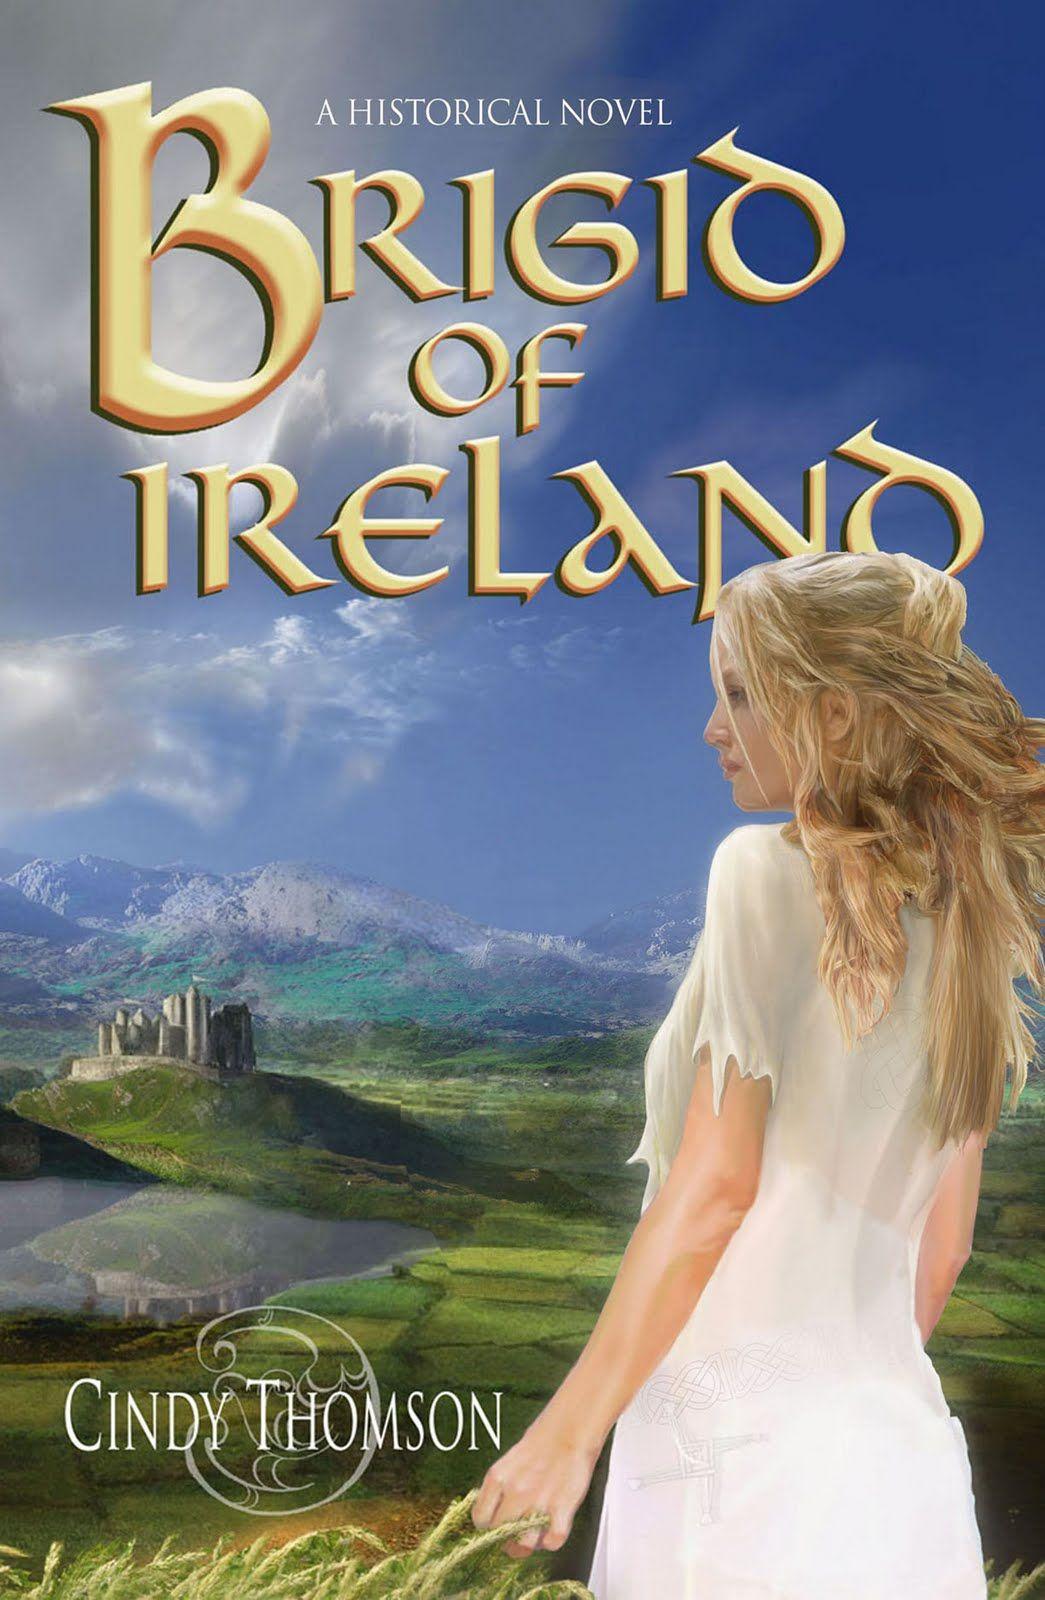 Cindy Thomson - Brigid of Ireland / https://www.goodreads.com/book/show/769739.Brigid_of_Ireland?from_search=true&search_version=service